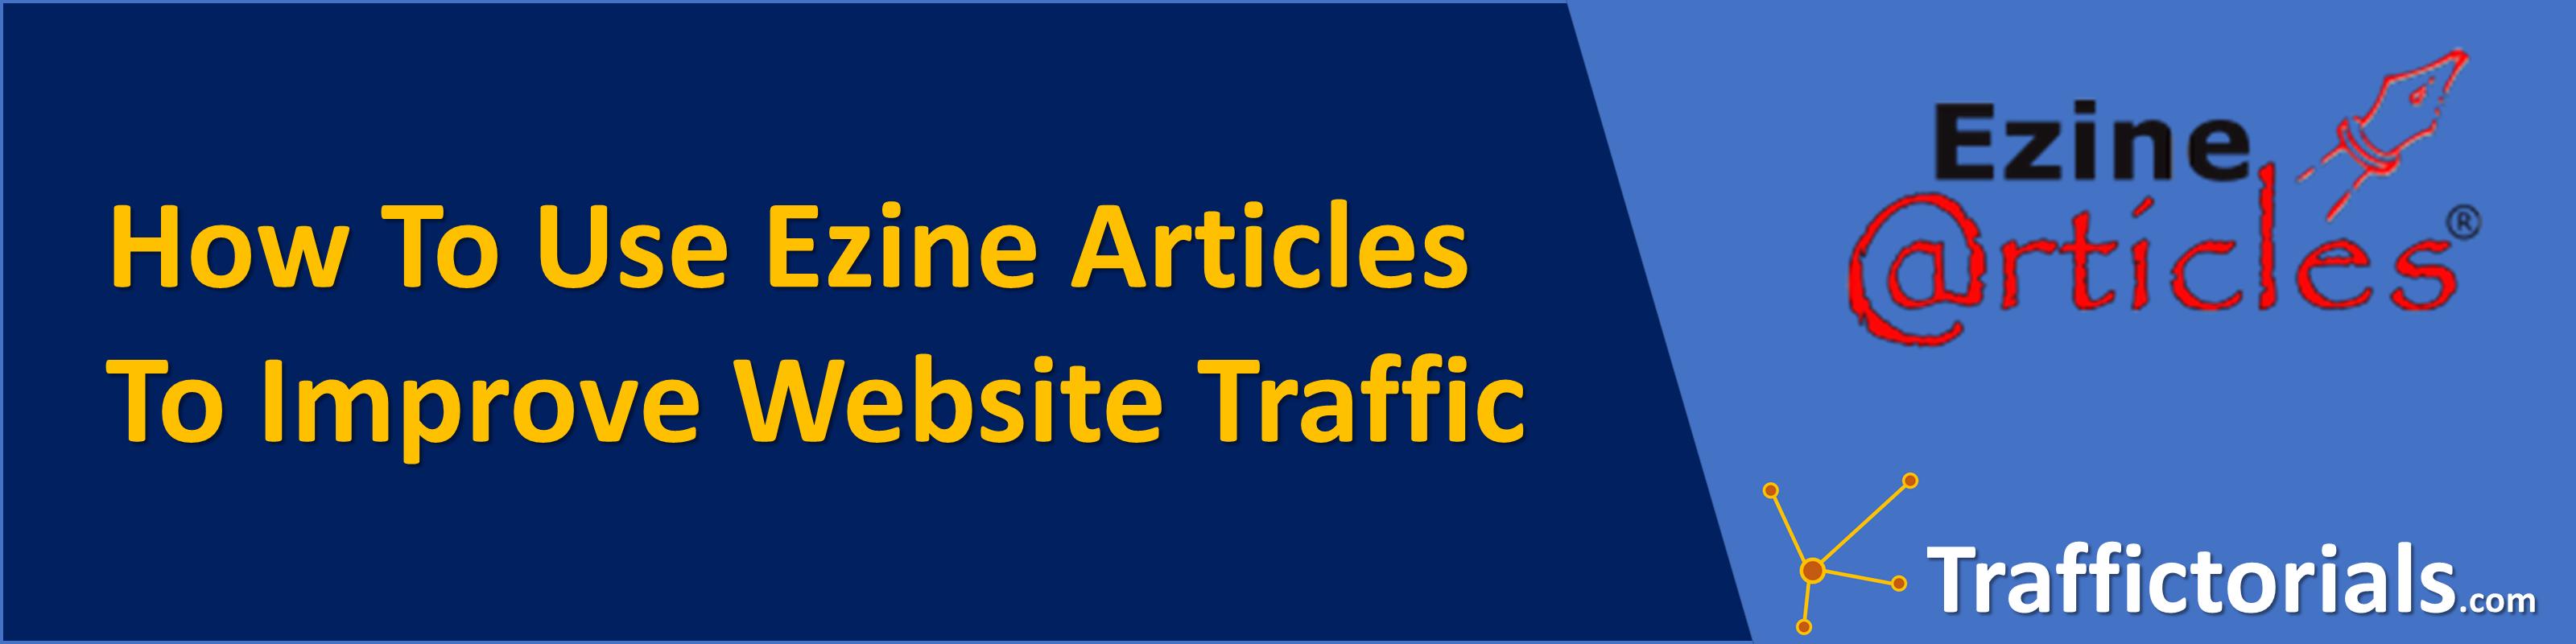 How To Use Ezine Articles